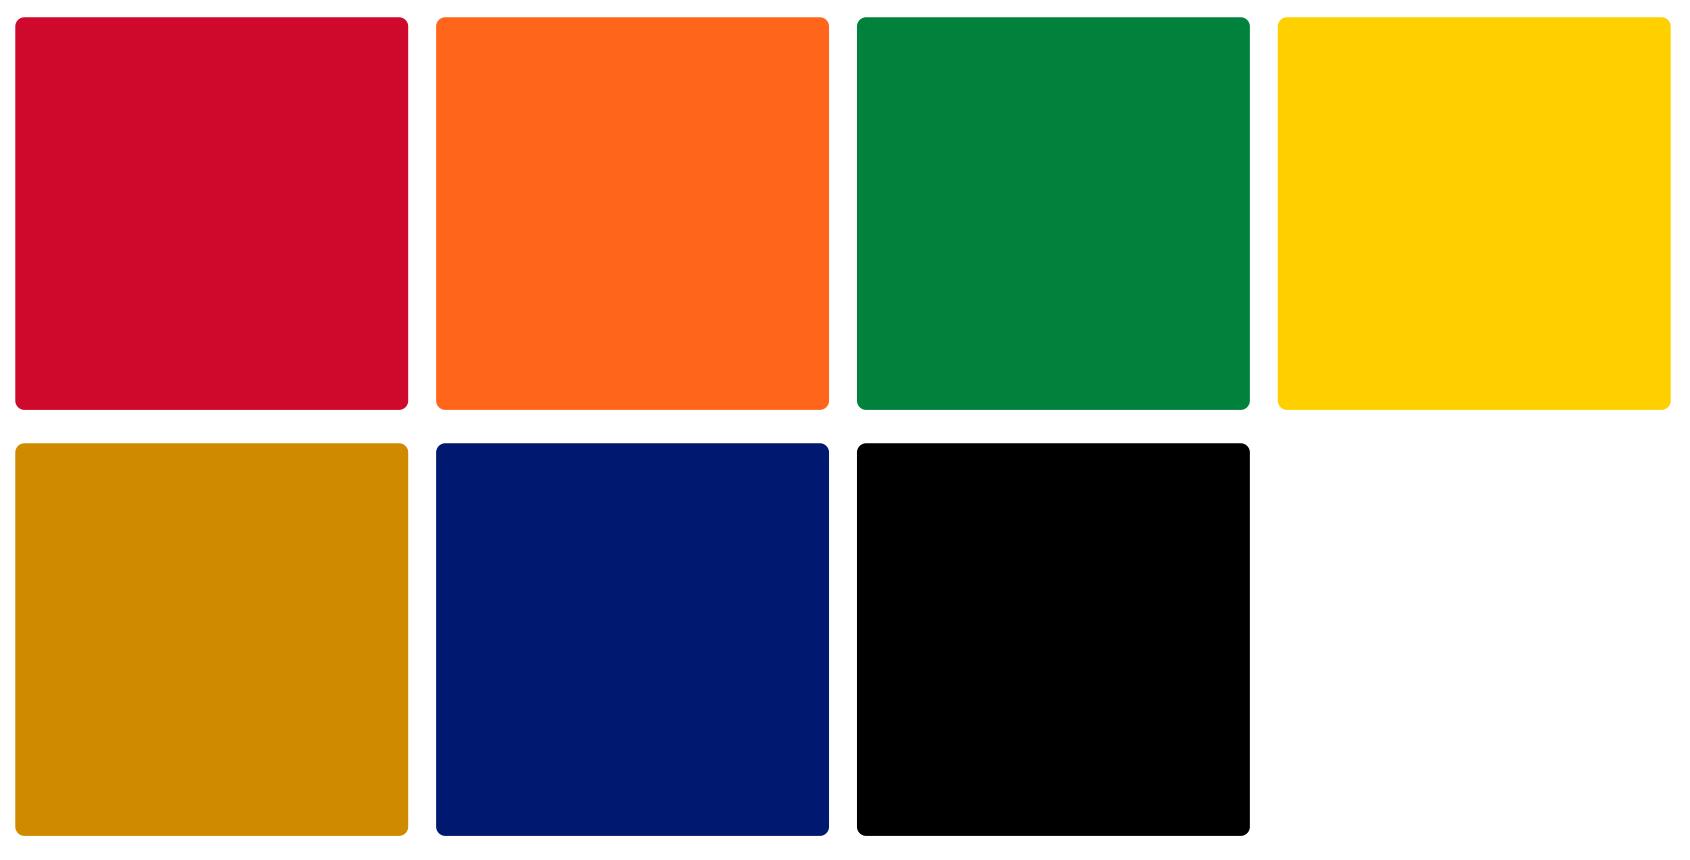 Chicago Blackhawks Color Palette Image